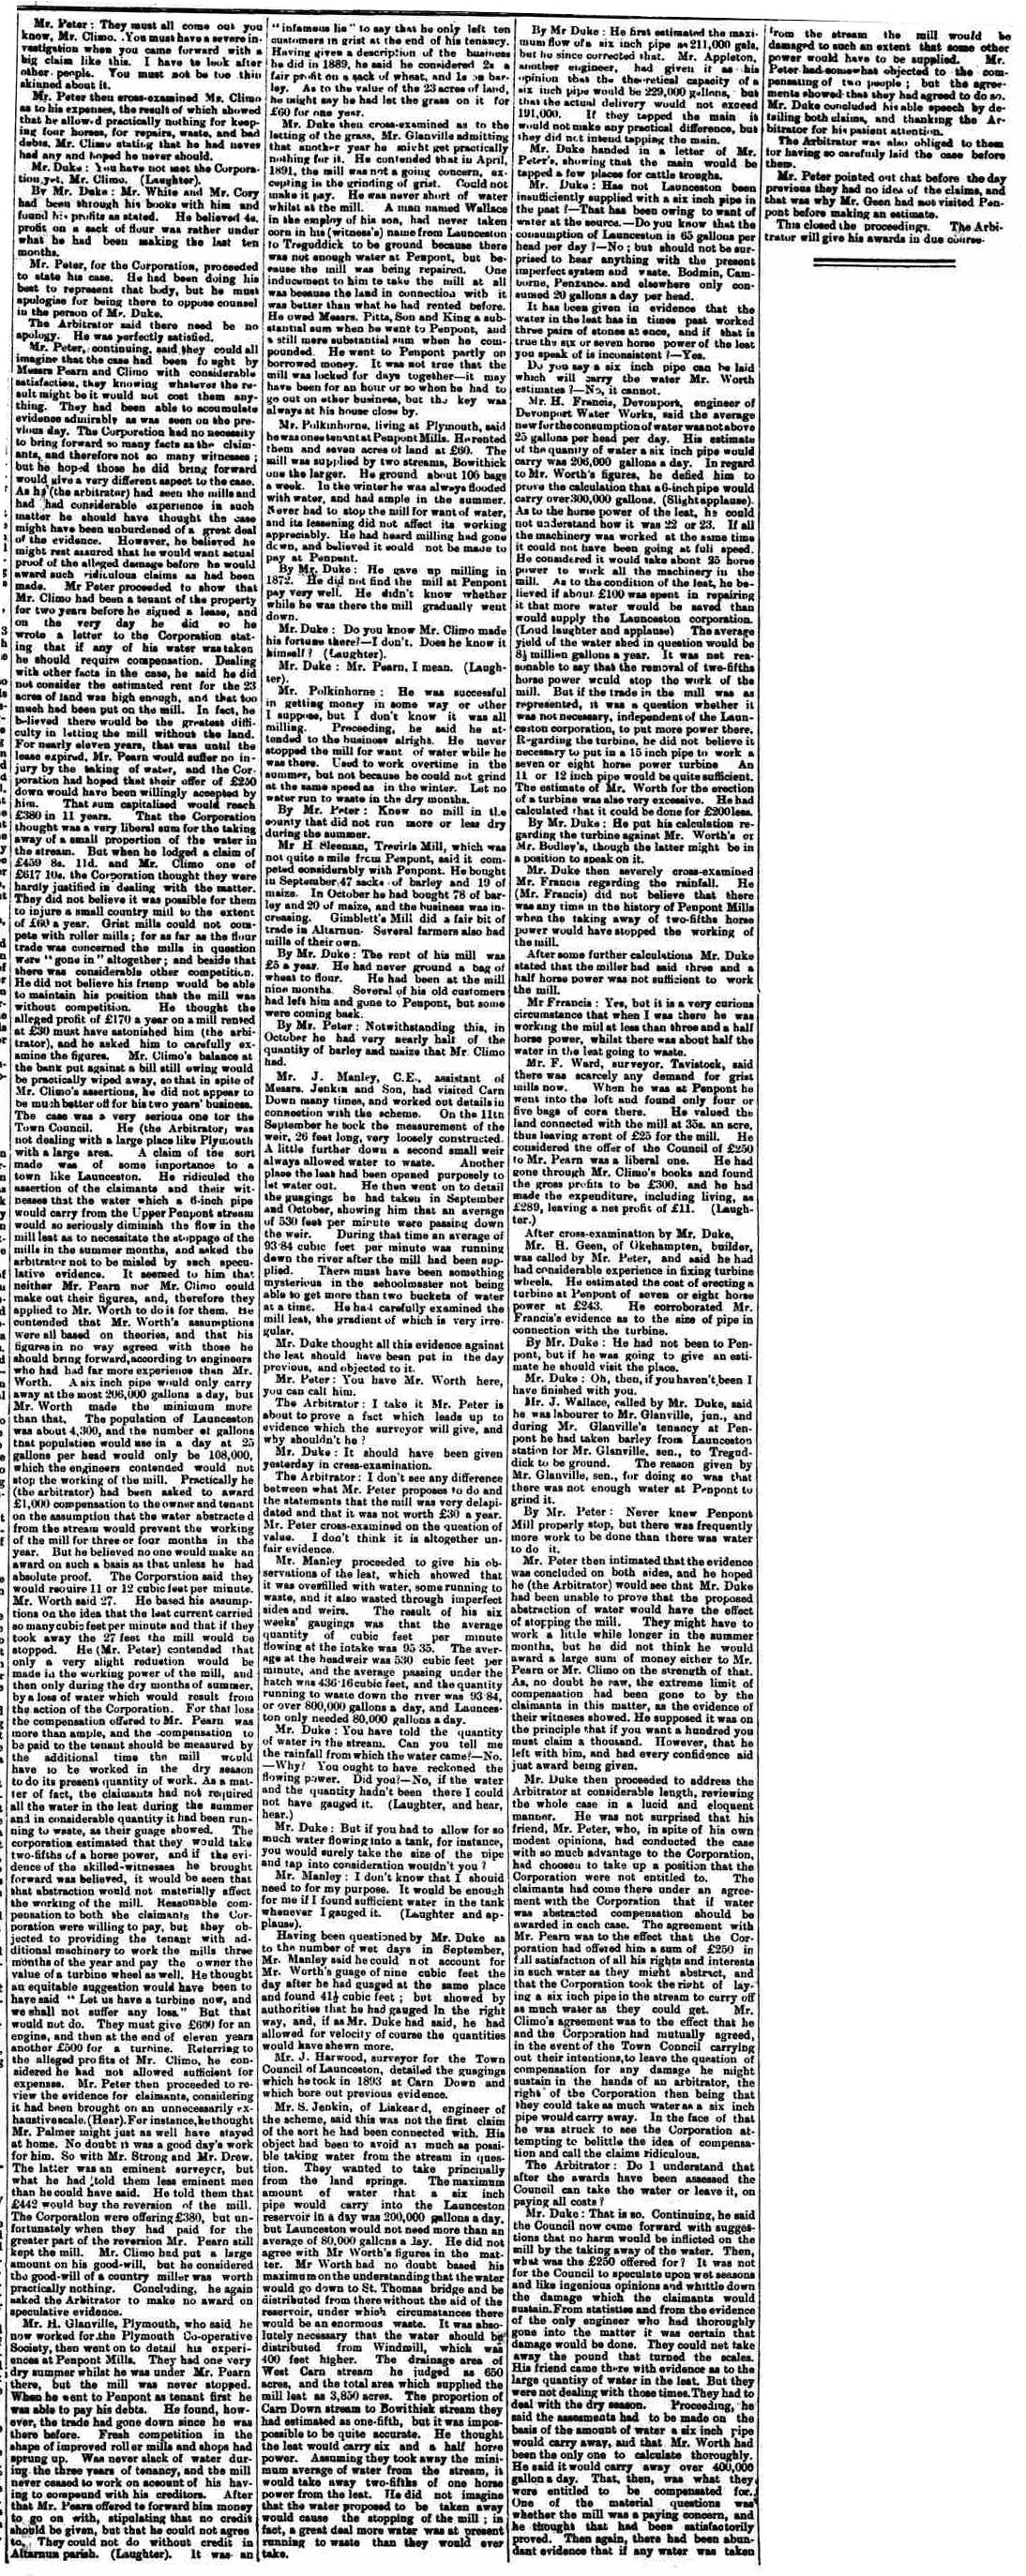 03 November 1894 part two